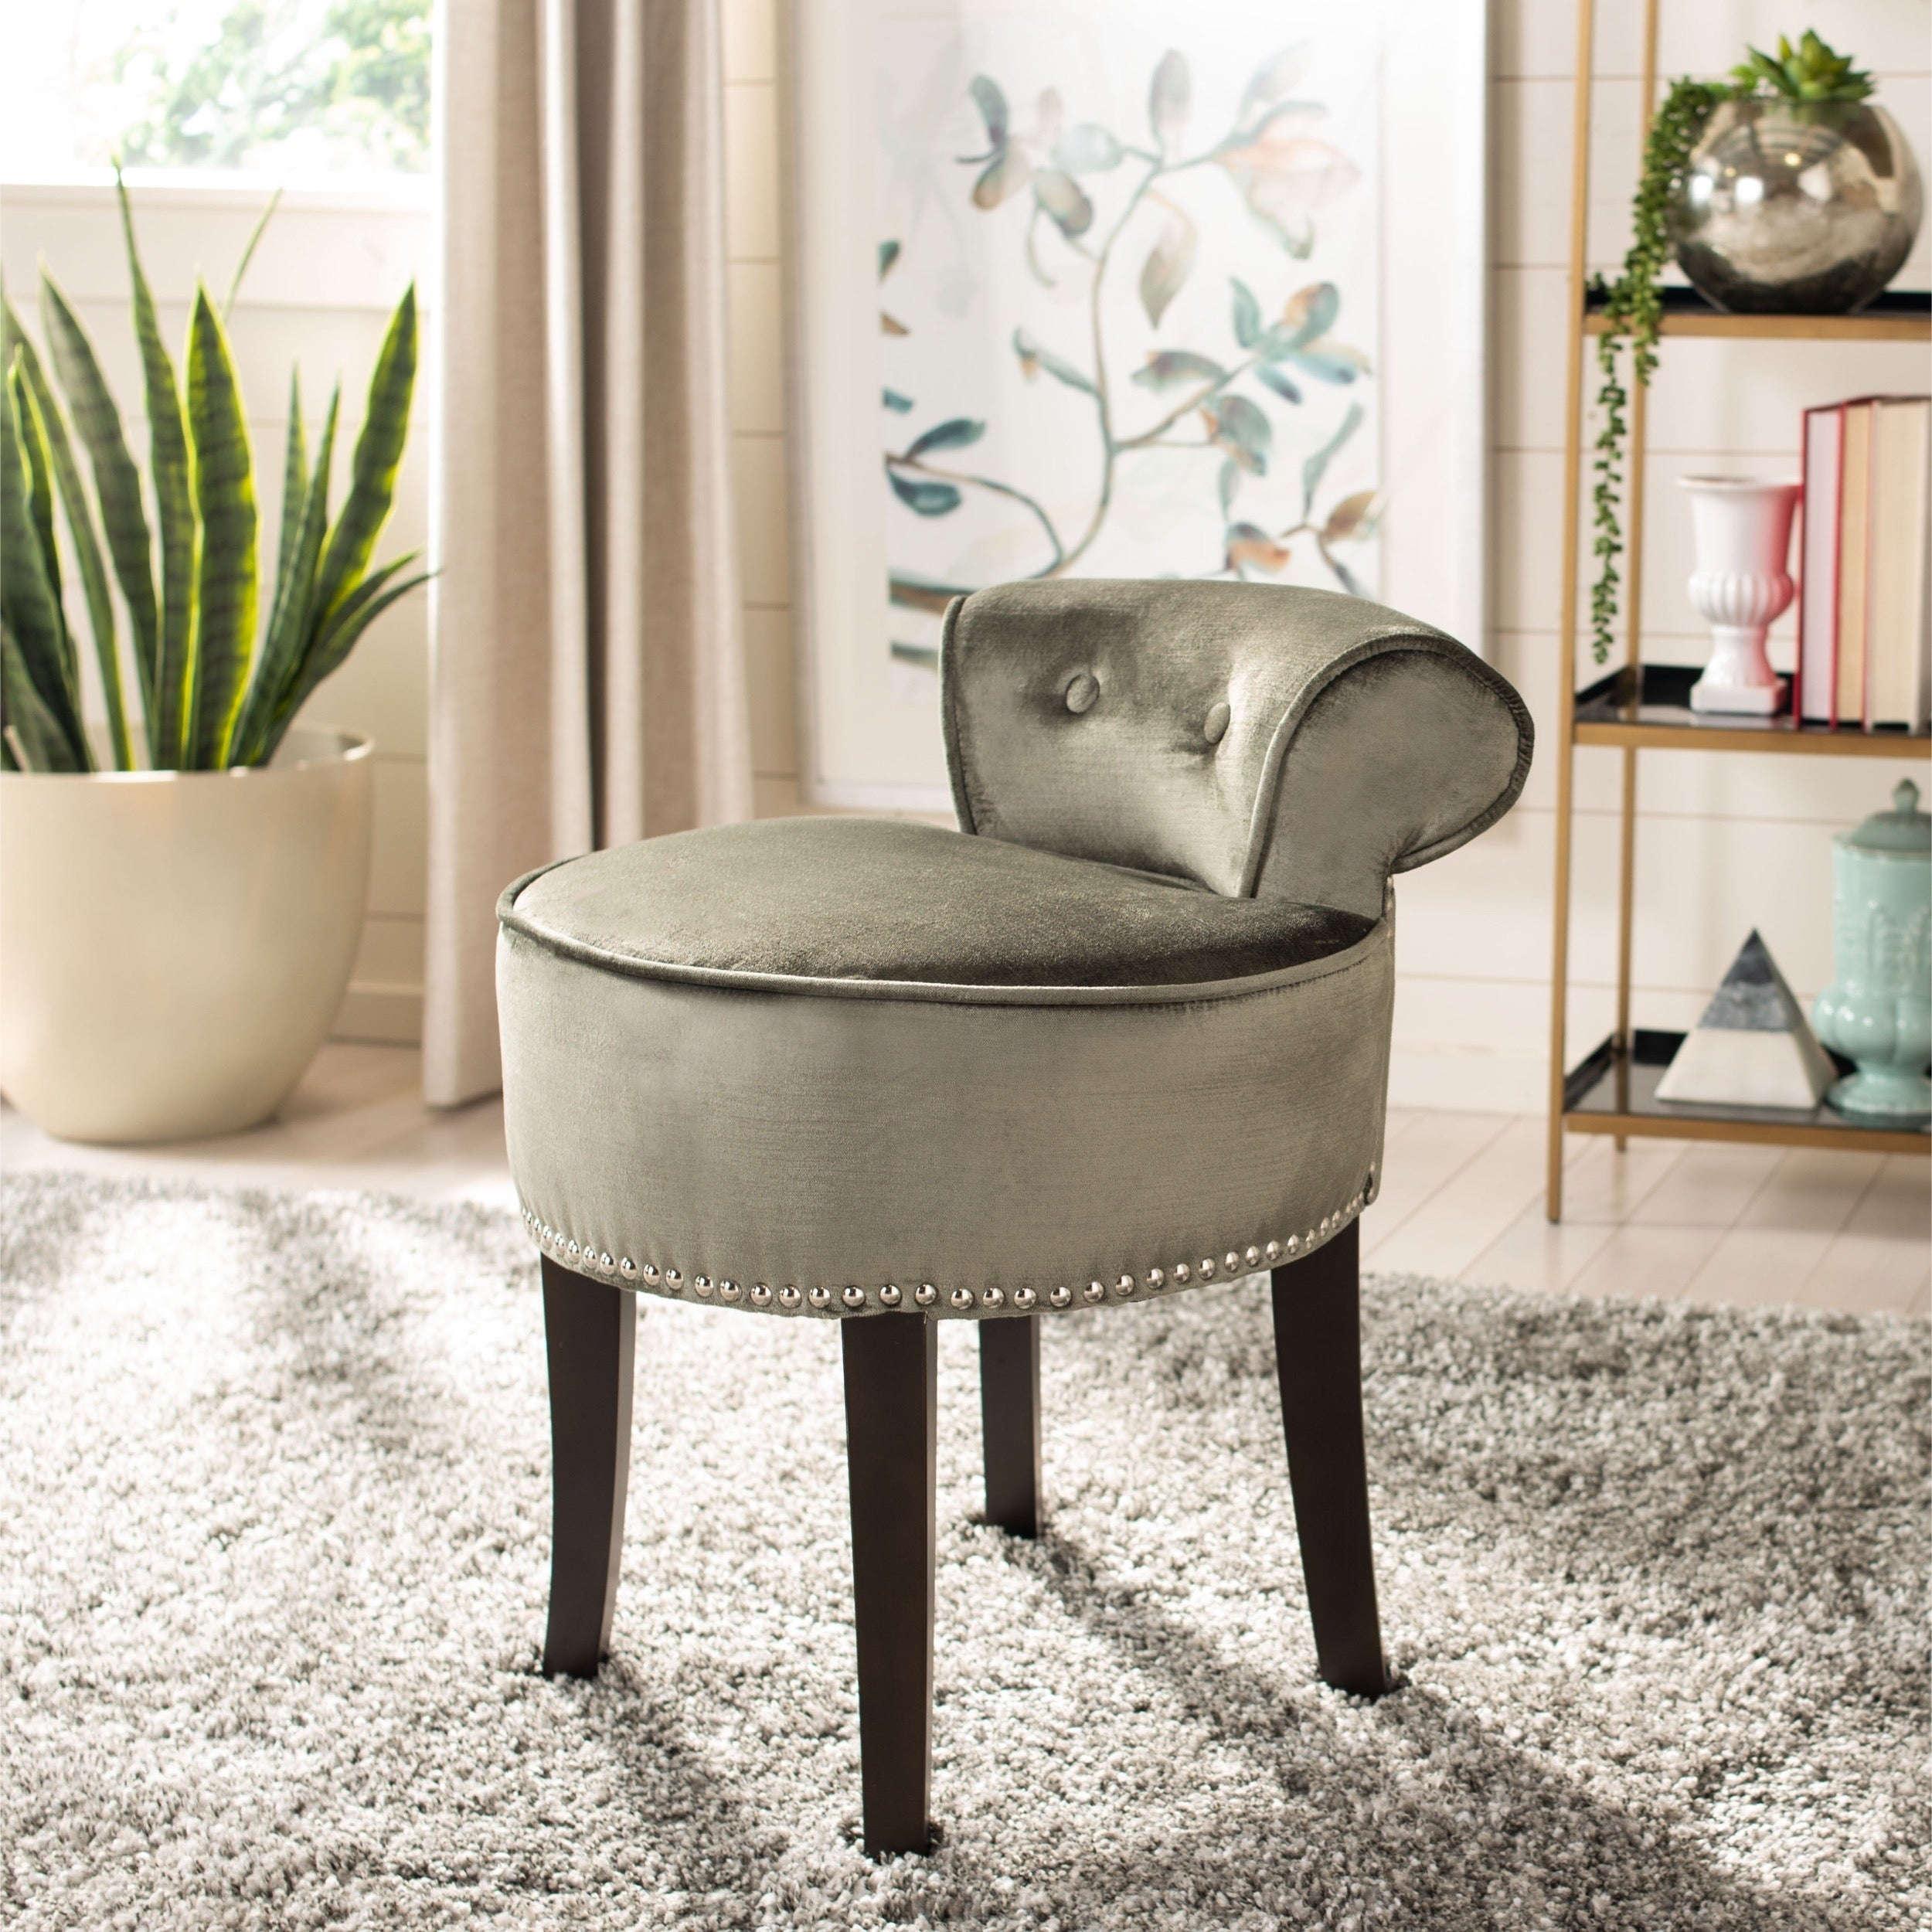 Pleasant Safavieh Georgia Pewter Vanity Stool 18W X 19D X 23H Machost Co Dining Chair Design Ideas Machostcouk